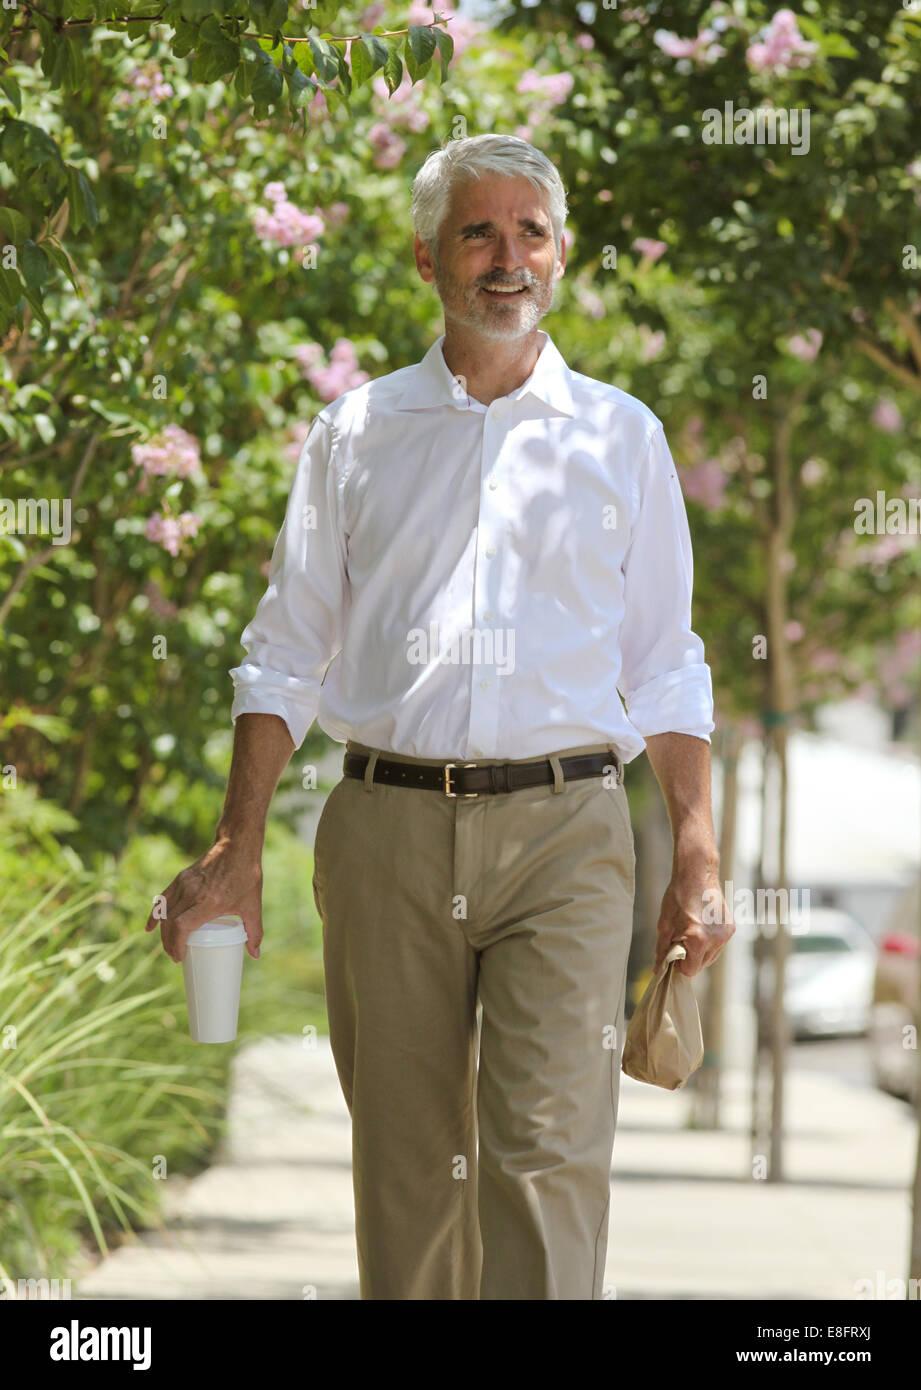 Businessman walking down street Photo Stock